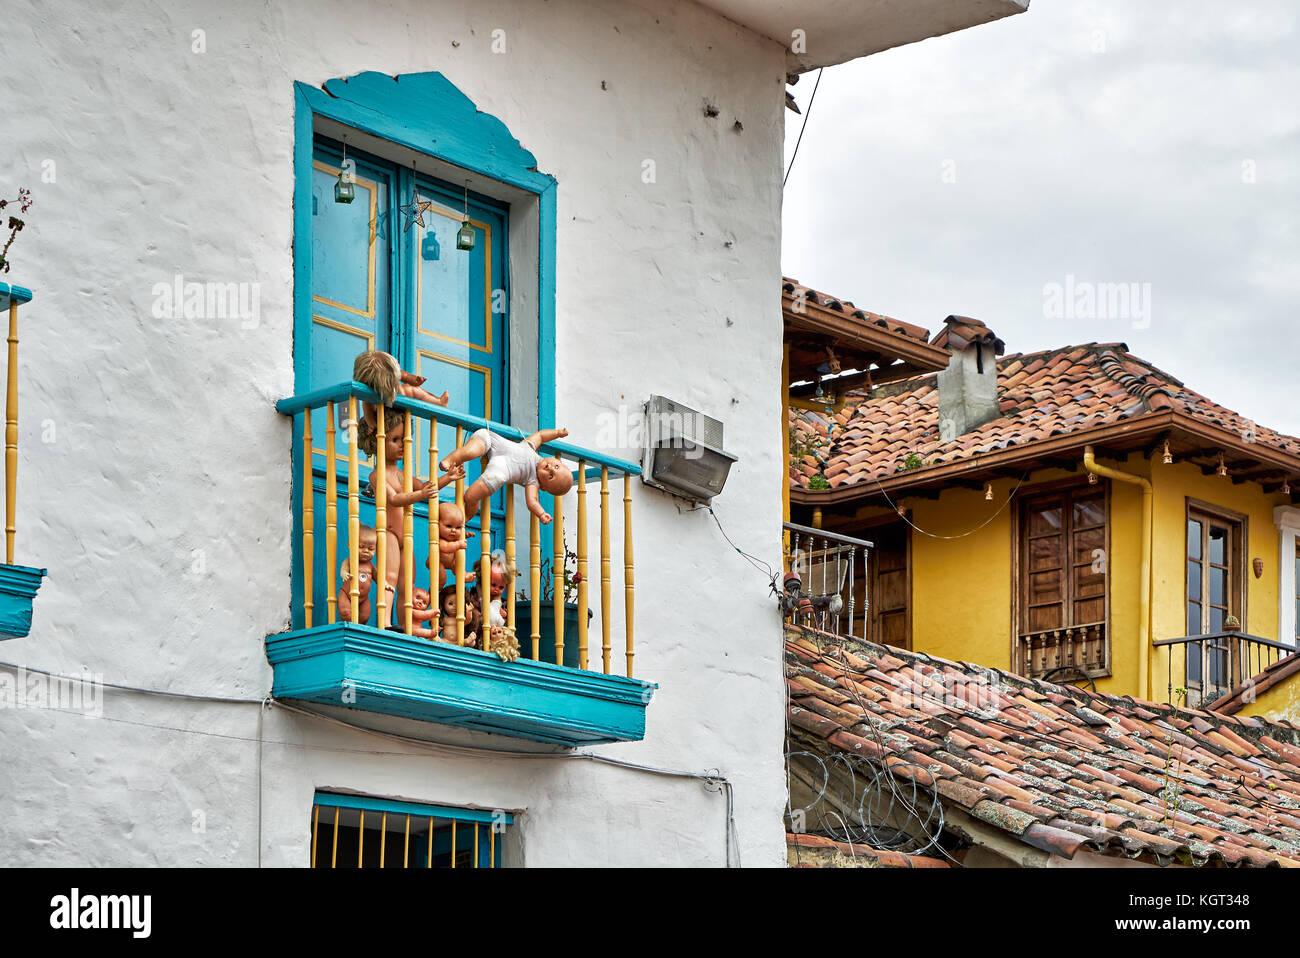 Typisches Gebaeude im Stadtteil, La Candelaria Bogota, Kolumbien, Suedamerika |bâtiment typique dans la Candelaria, Photo Stock